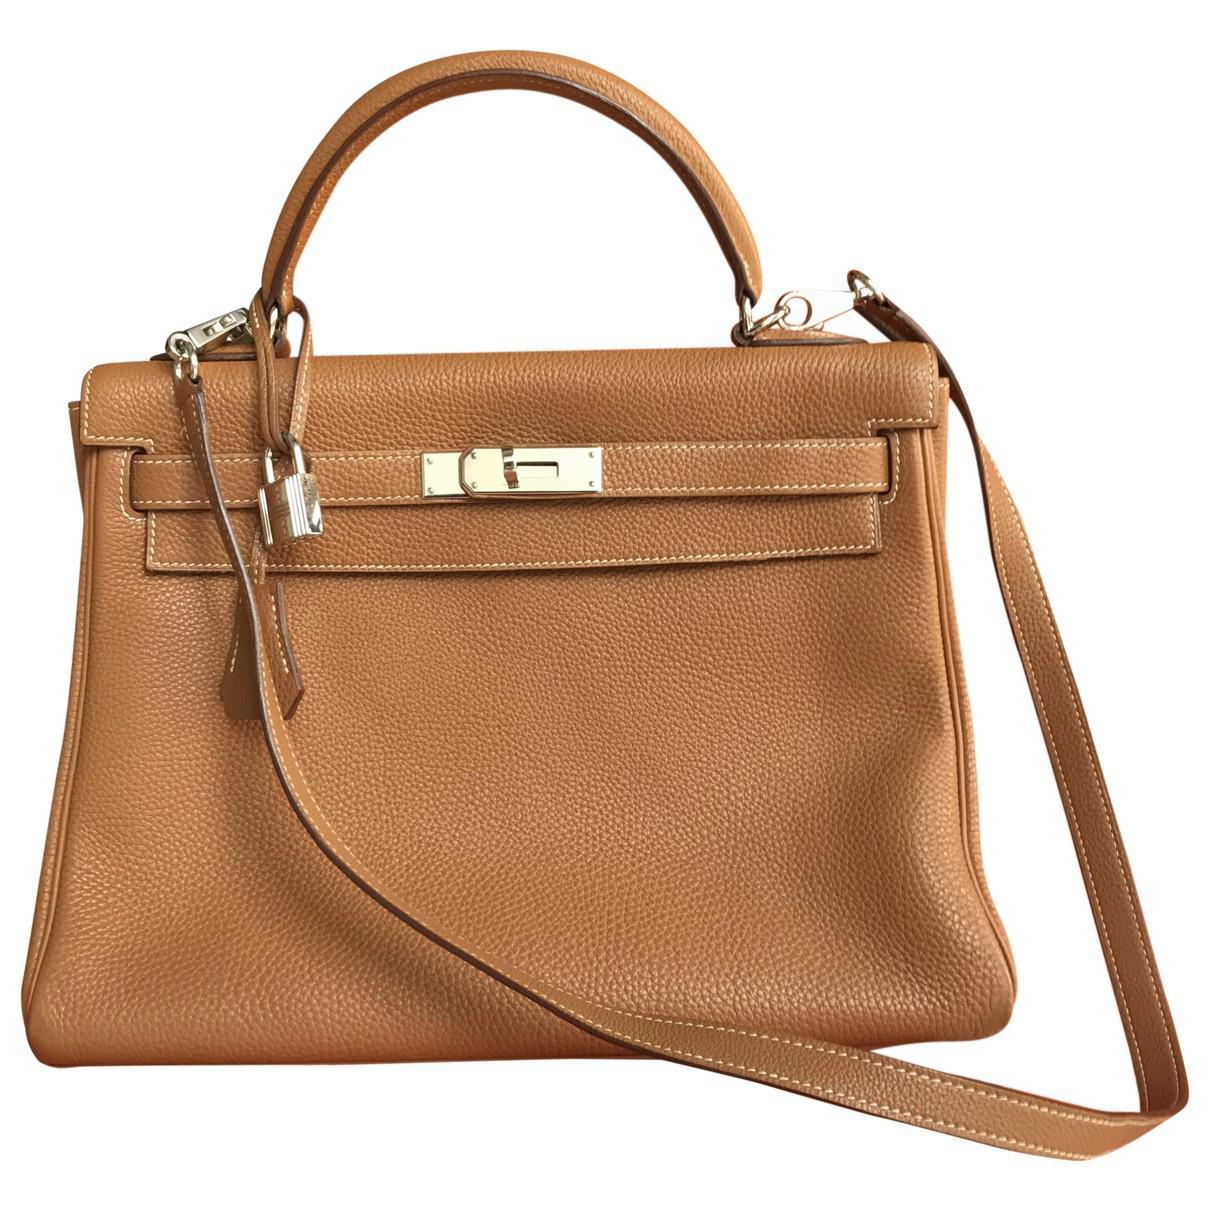 Hermès Pre-owned - Kelly 32 leather handbag FYIeXEO2